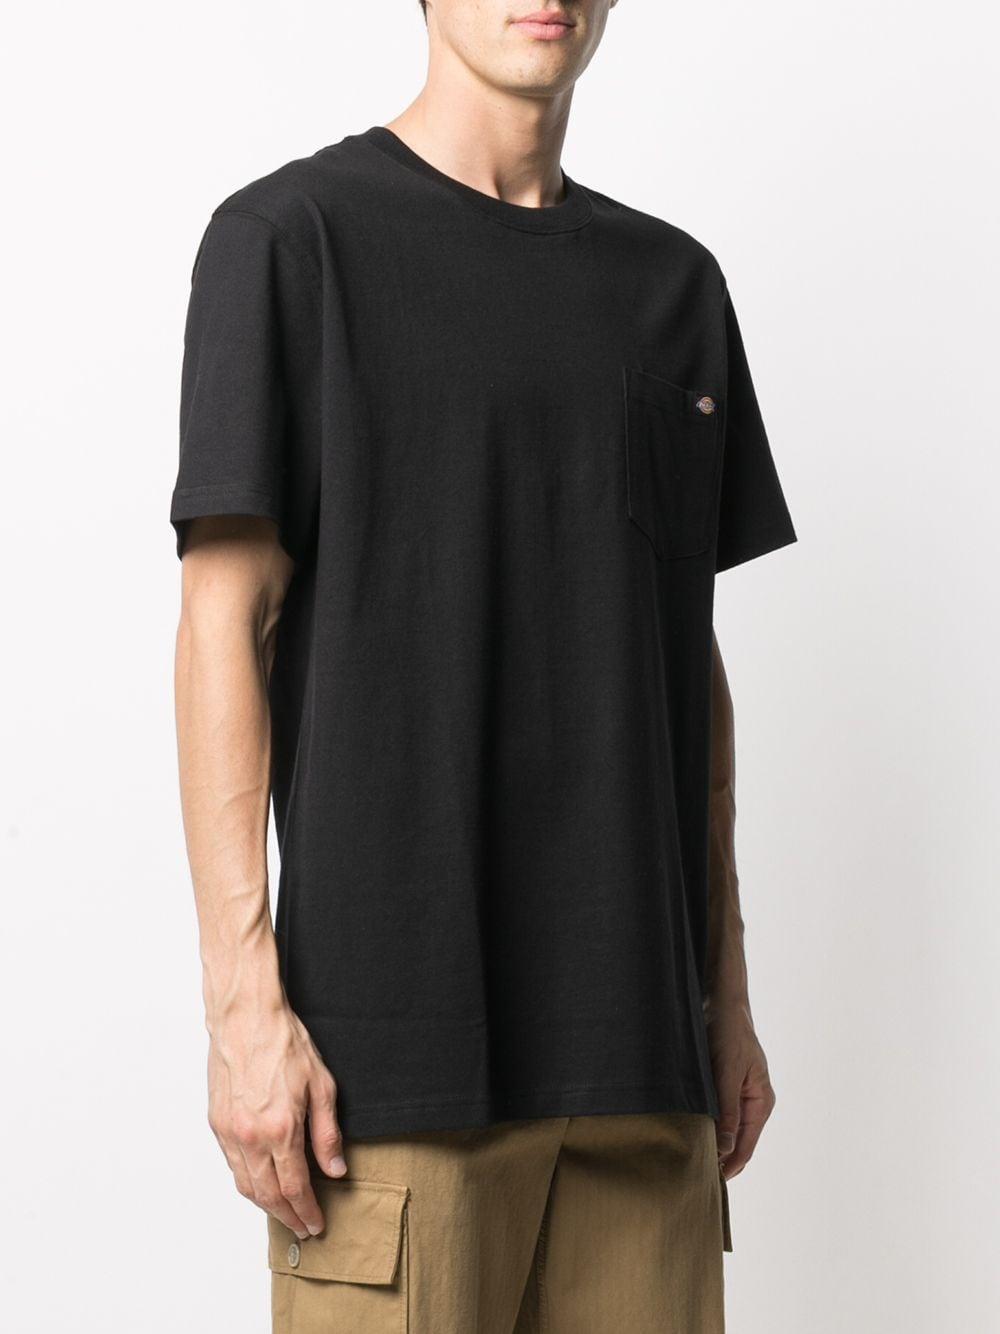 T-shirt con taschino uomo nero cotone DICKIES | T-shirt | DK0A4TMOBLK